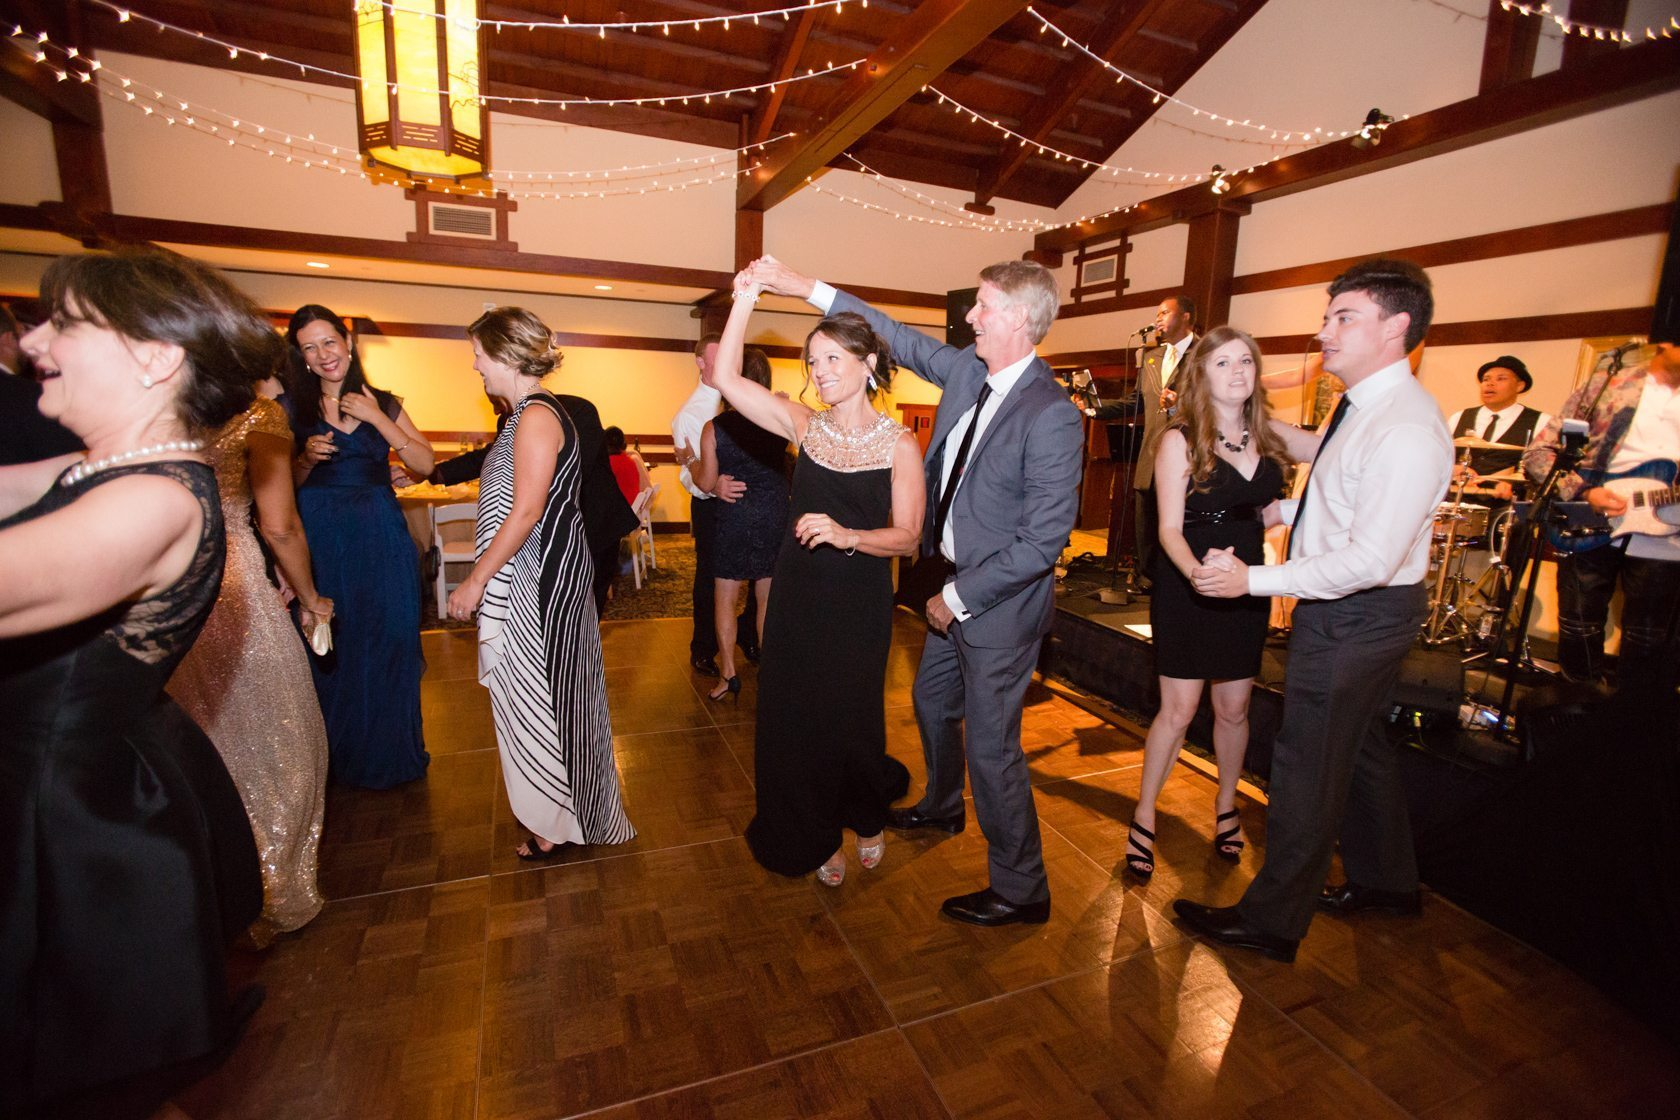 The_Lodge_at_Torrey_Pines_Wedding_117.jpg